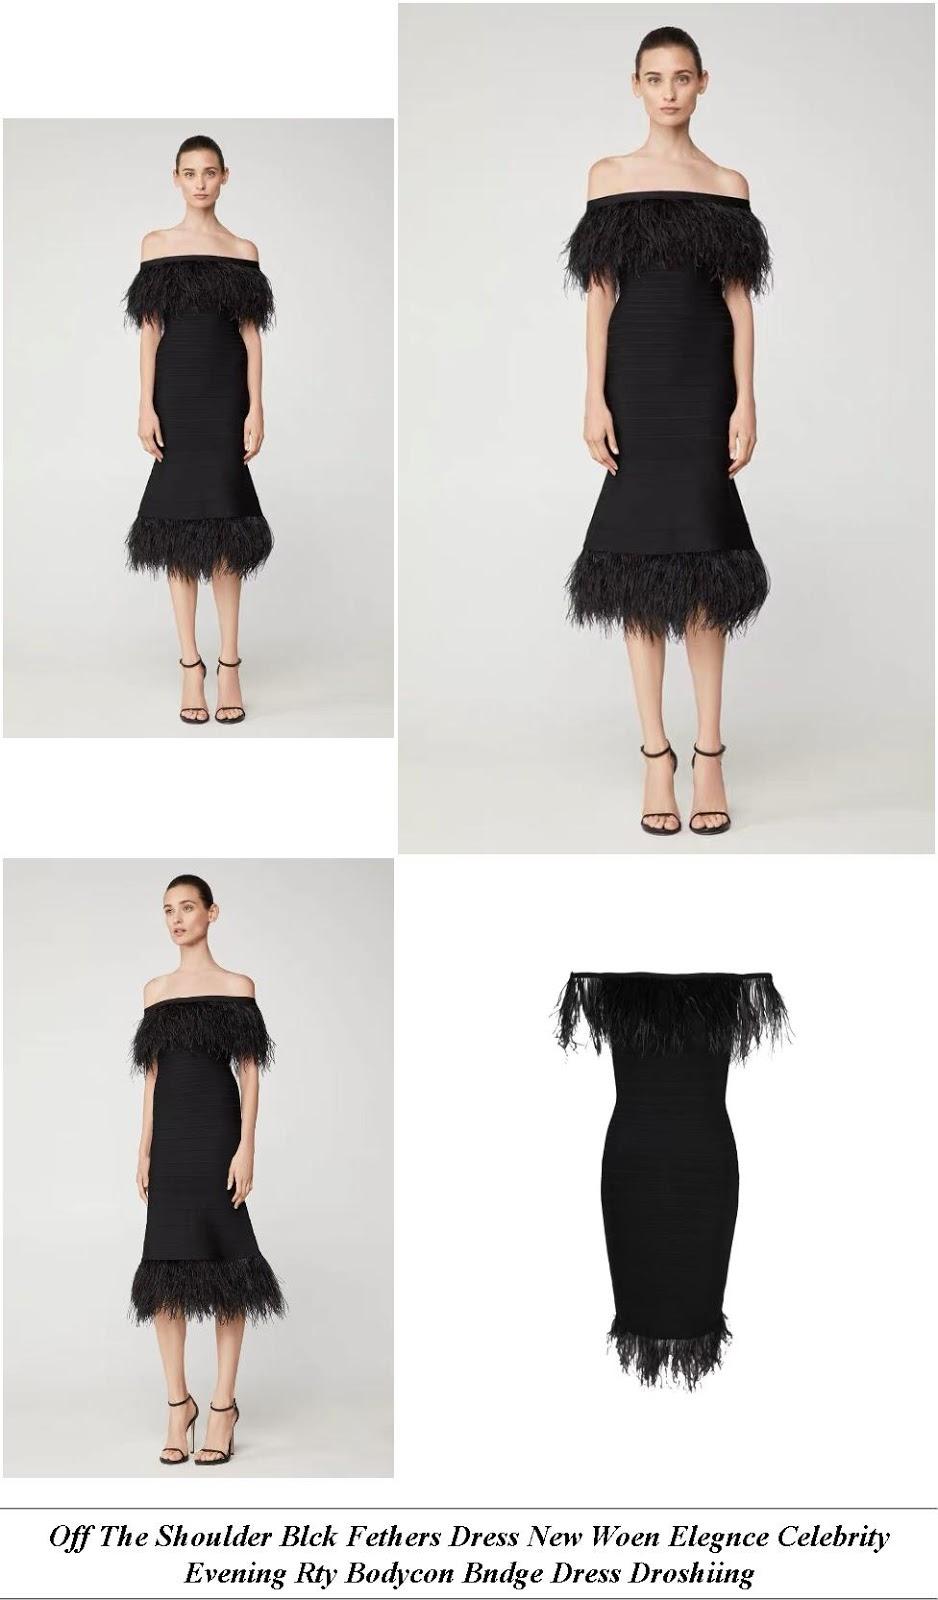 Red Lace Cocktail Dress Plus Size - Authentic Vintage Clothing Online - Designer Evening Dresses Toronto